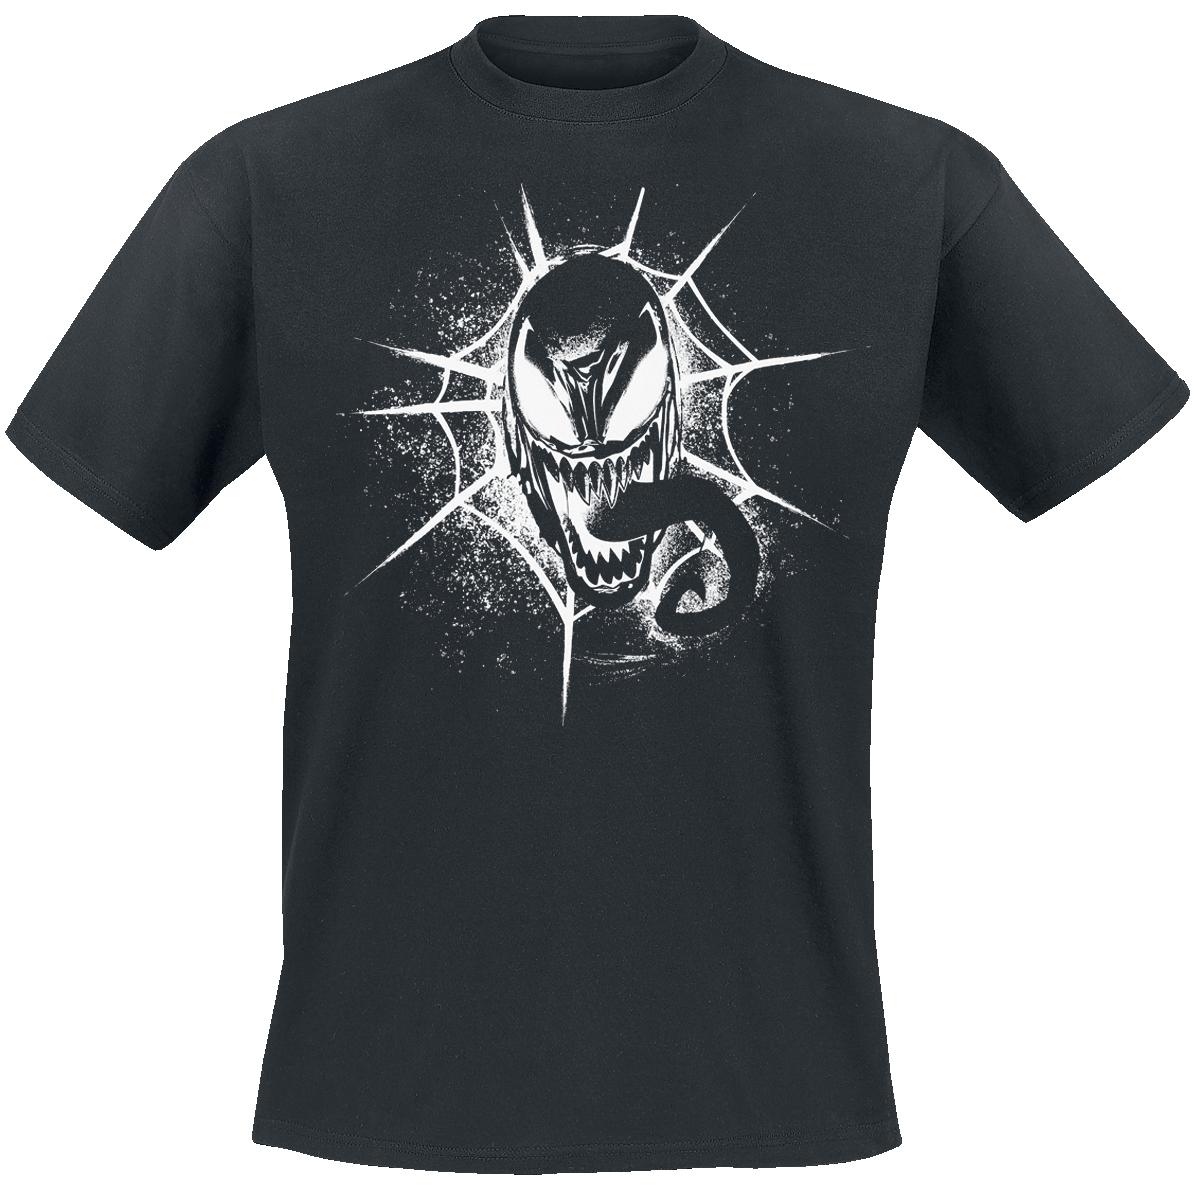 Venom (Marvel) - Head - T-Shirt - black image